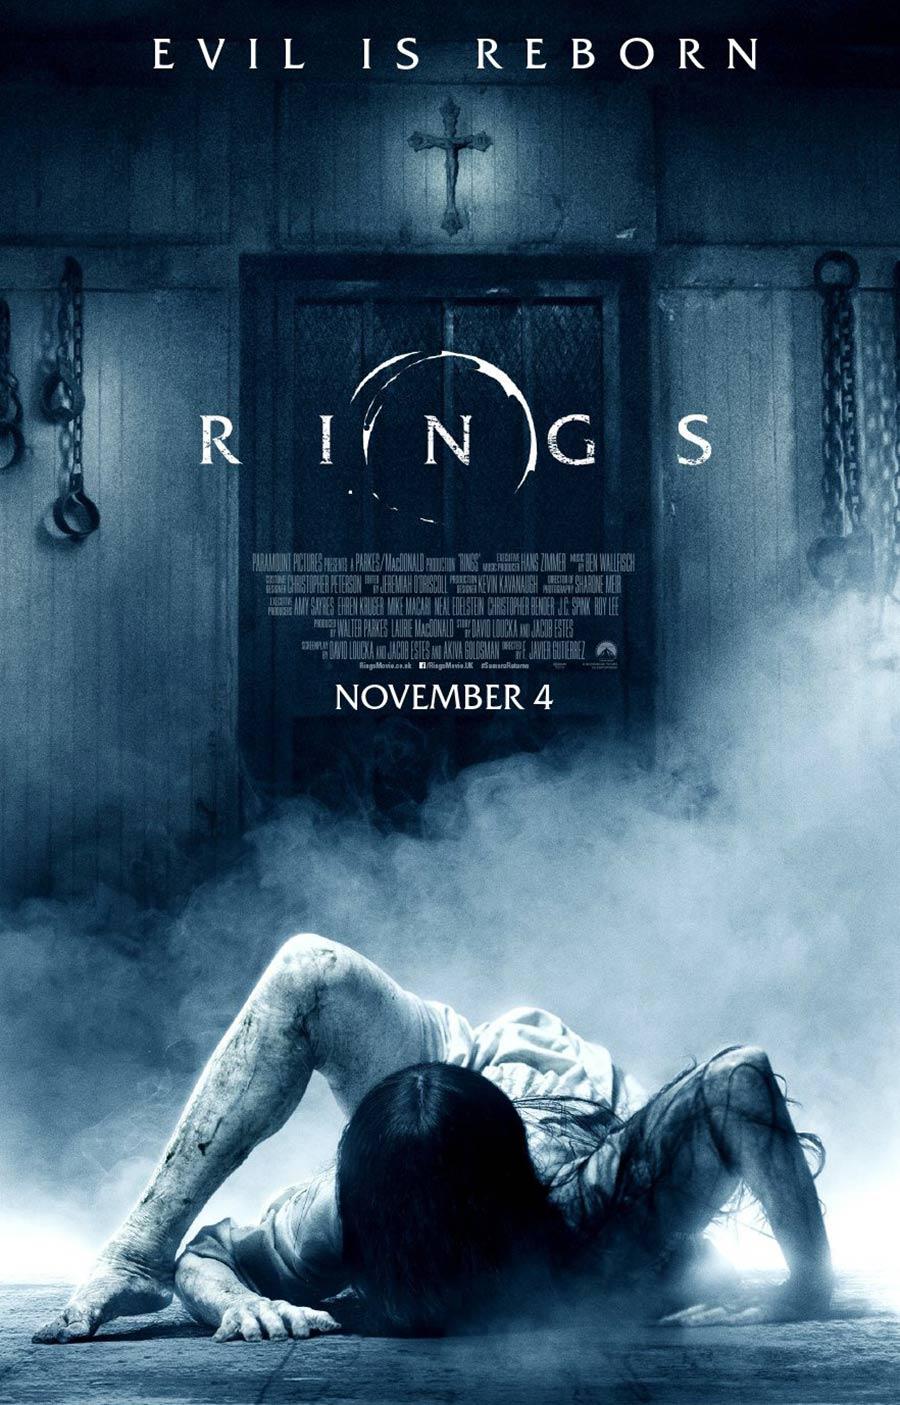 Rings (2017)dvdplanetstorepk